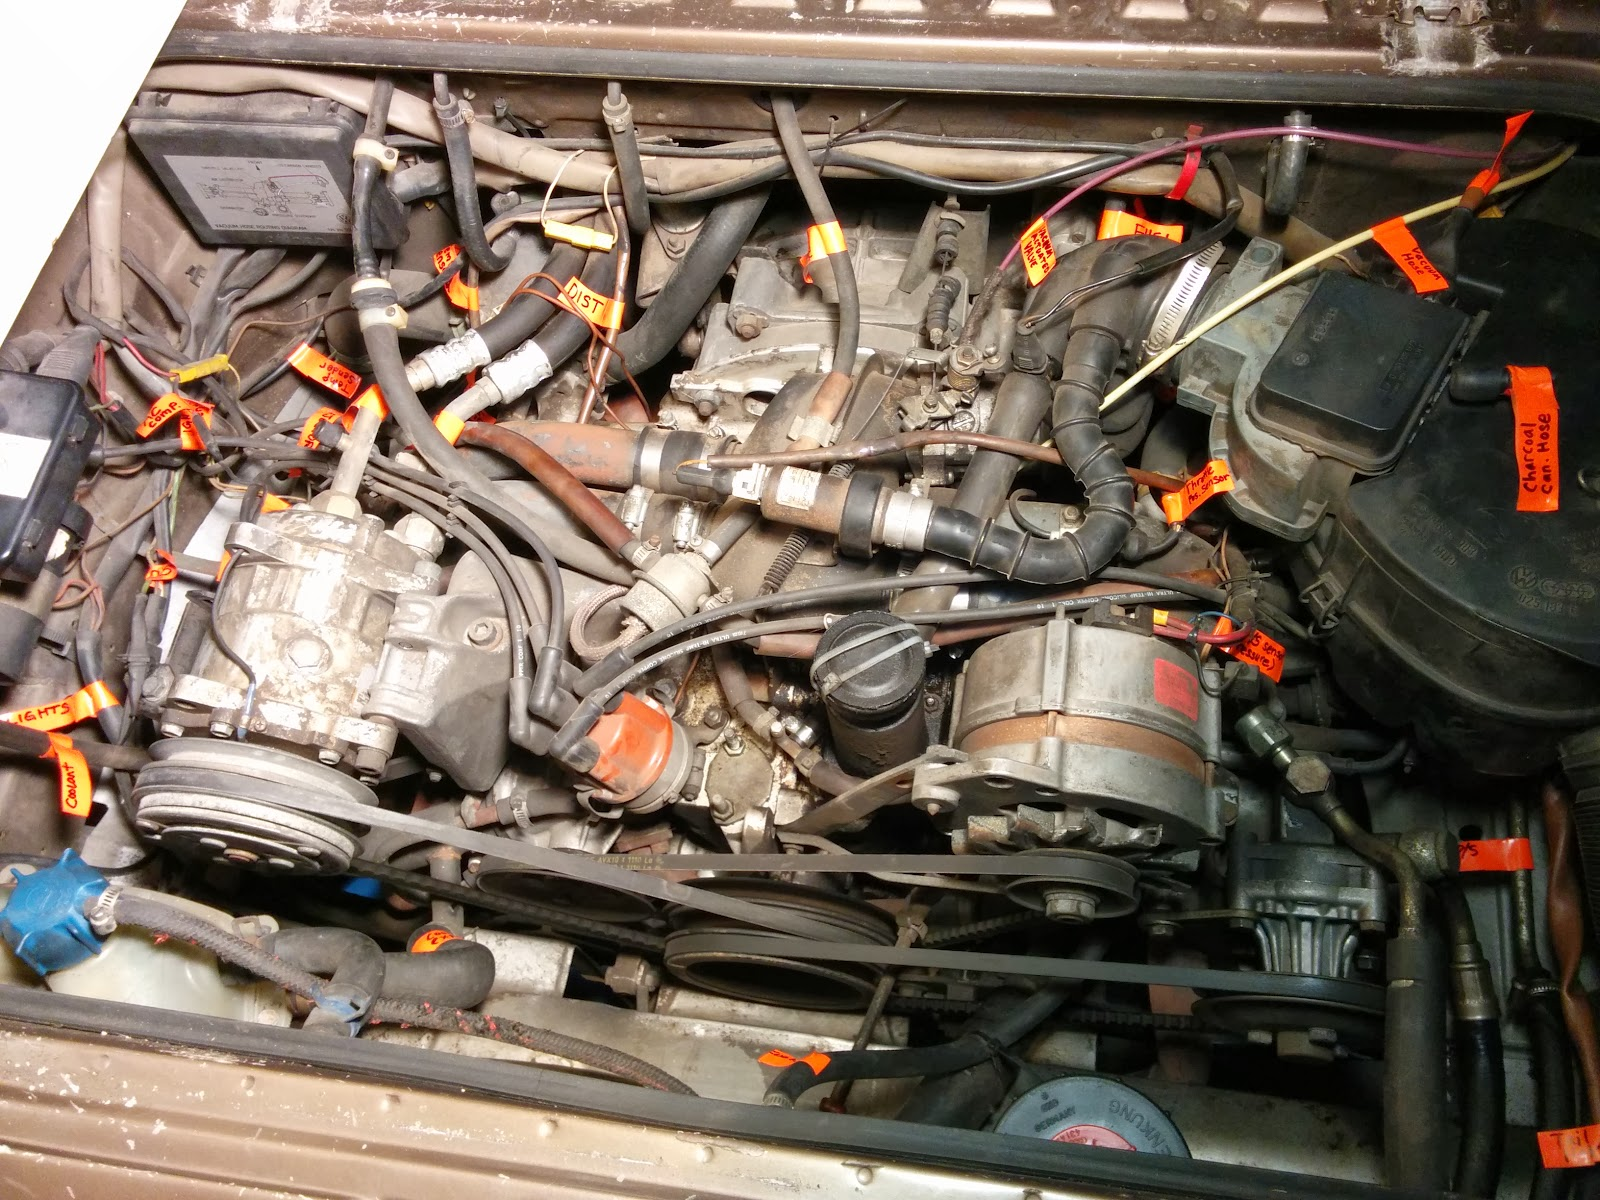 1980 Vw Vanagon Engine Diagram